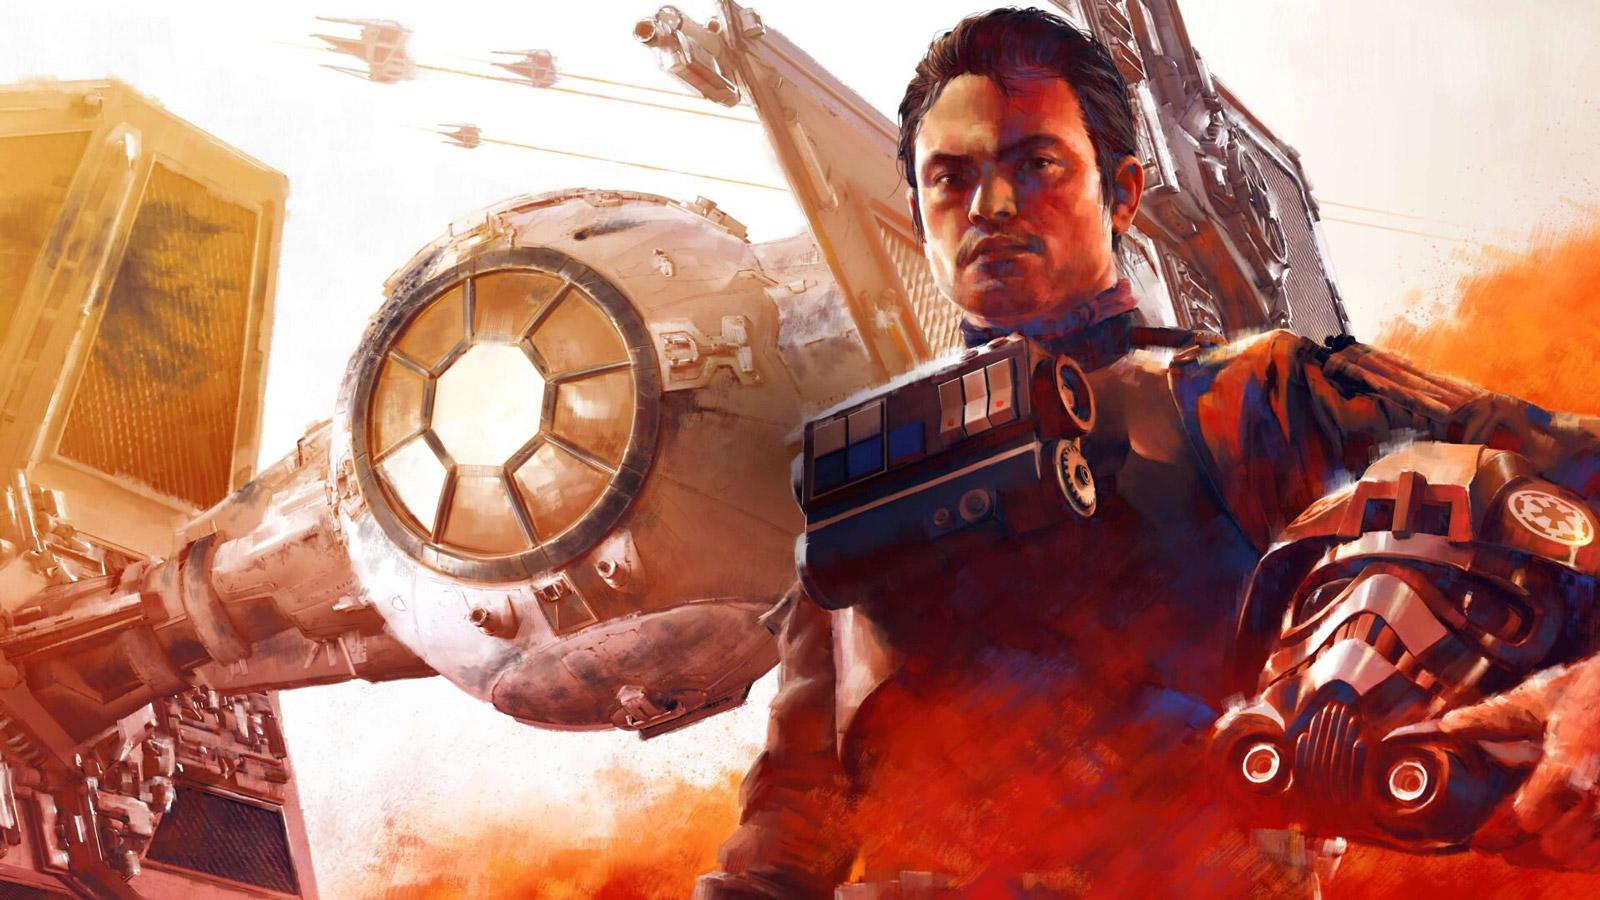 Star Wars: Squadrons Wallpaper in 1600x900